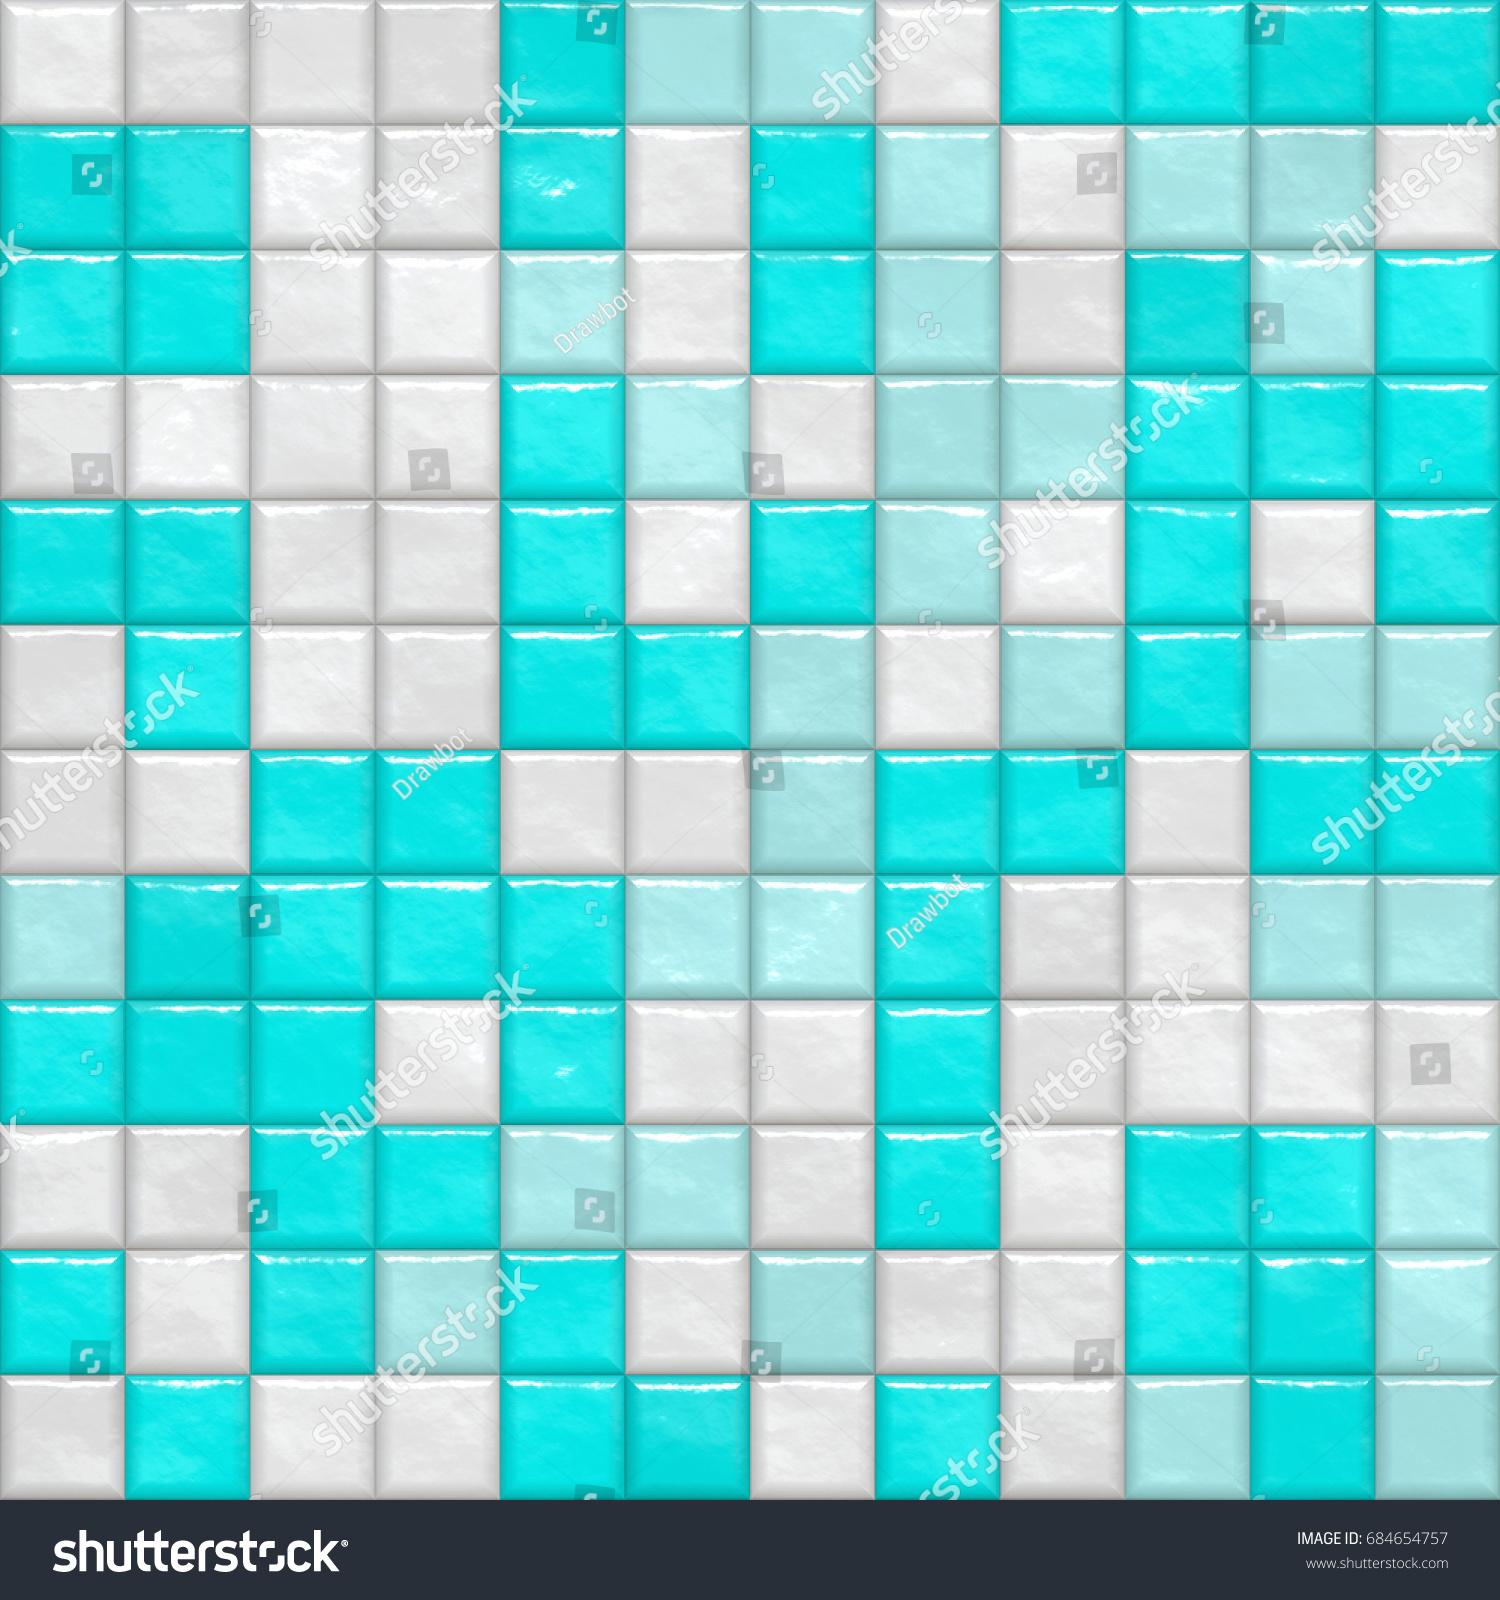 Closeup Colorful Bathroom Pool Ceramic Tiles Stock Illustration ...